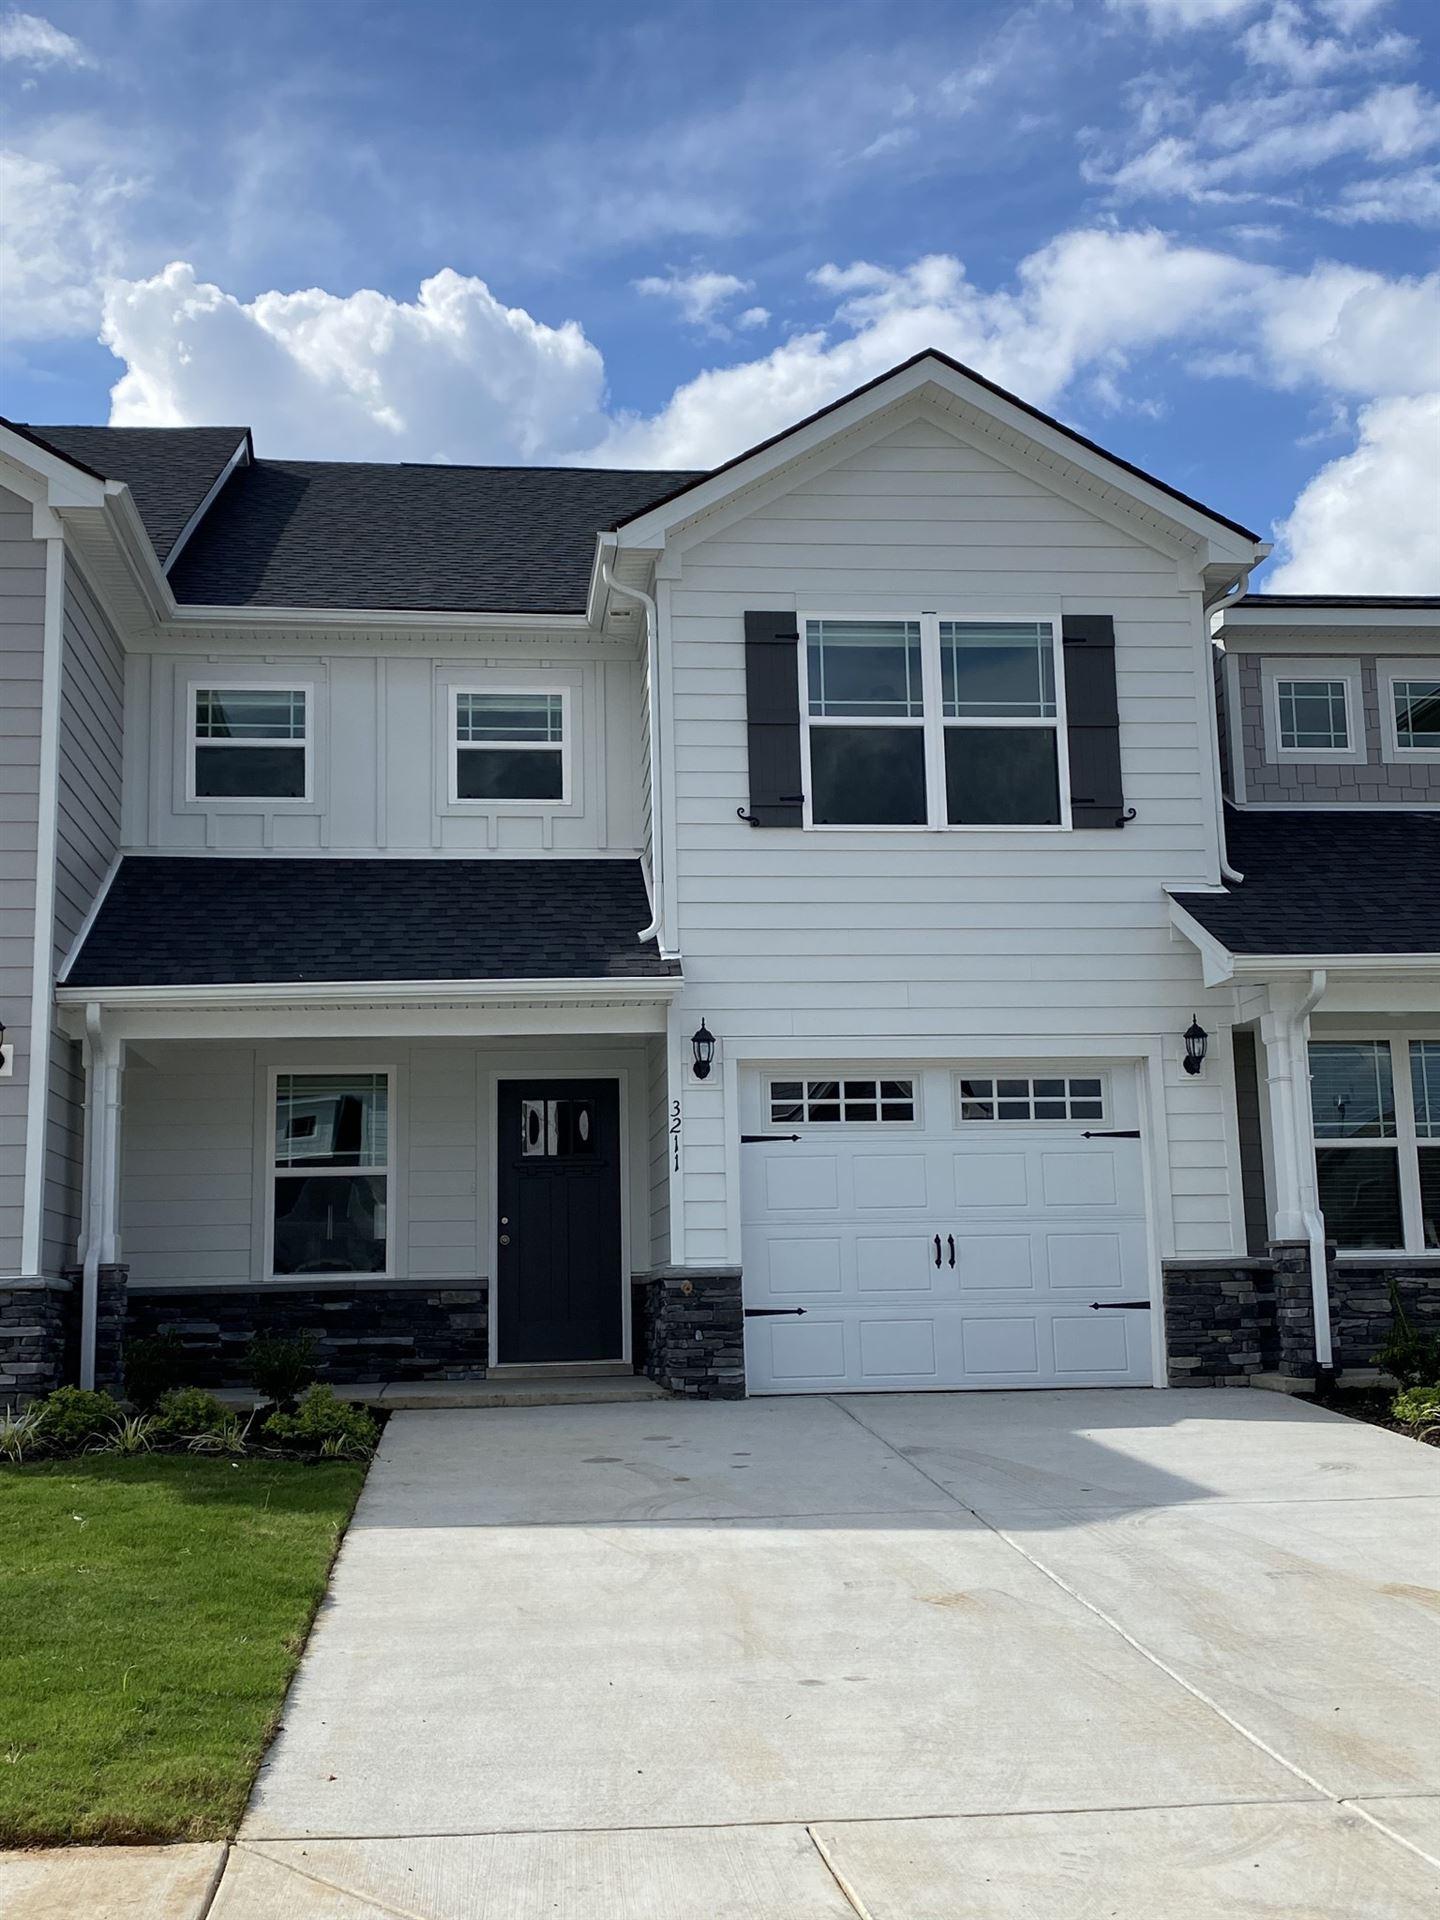 5317 Normandy Cob Drive lot 51 #51, Murfreesboro, TN 37129 - MLS#: 2299226